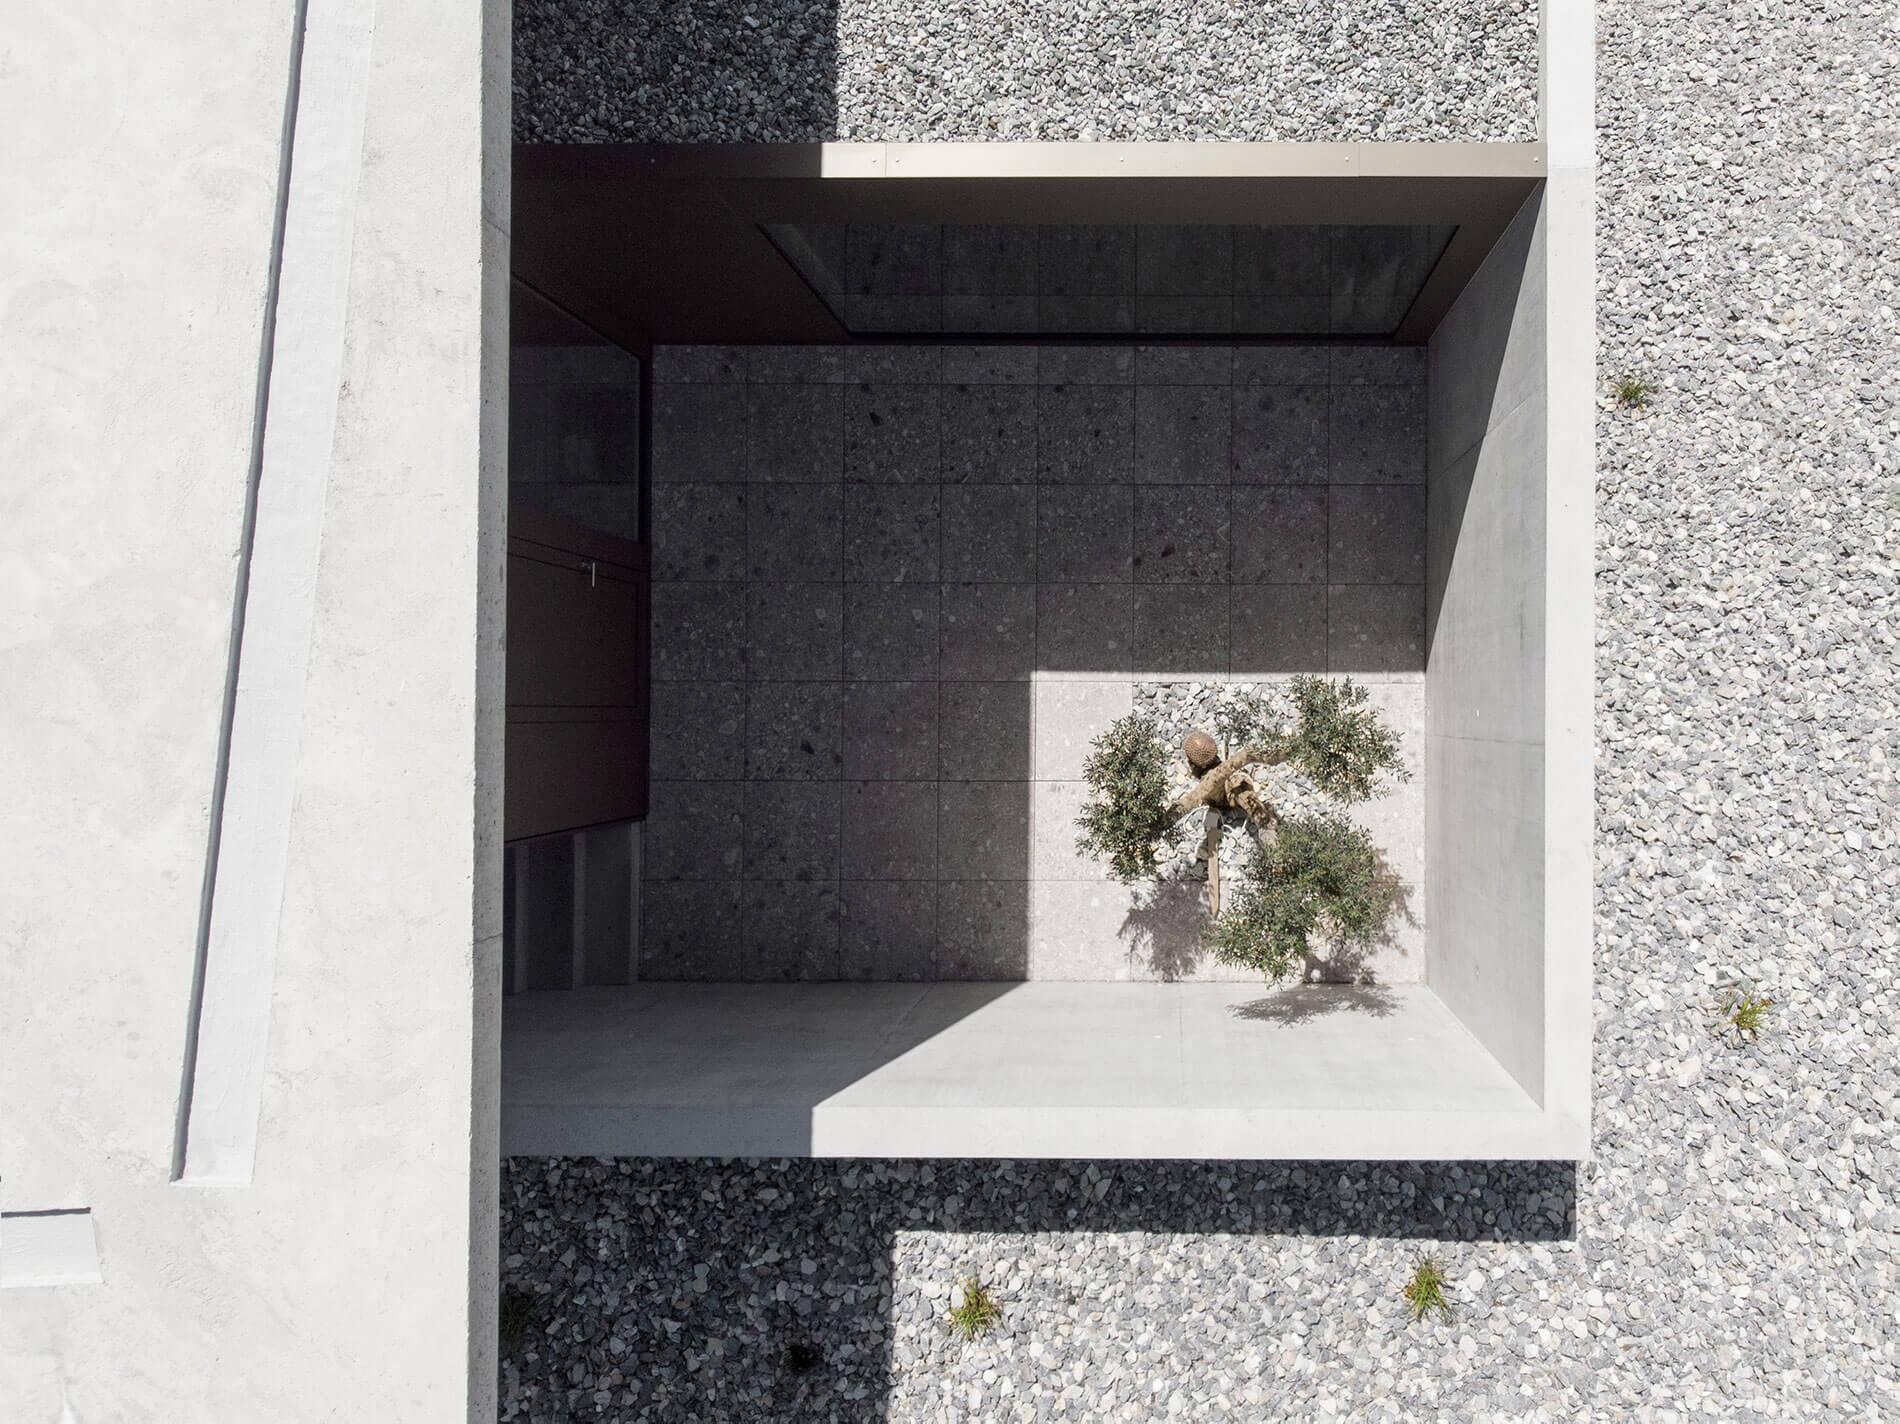 dvarchitectes-architecture-drone-patio.jpg